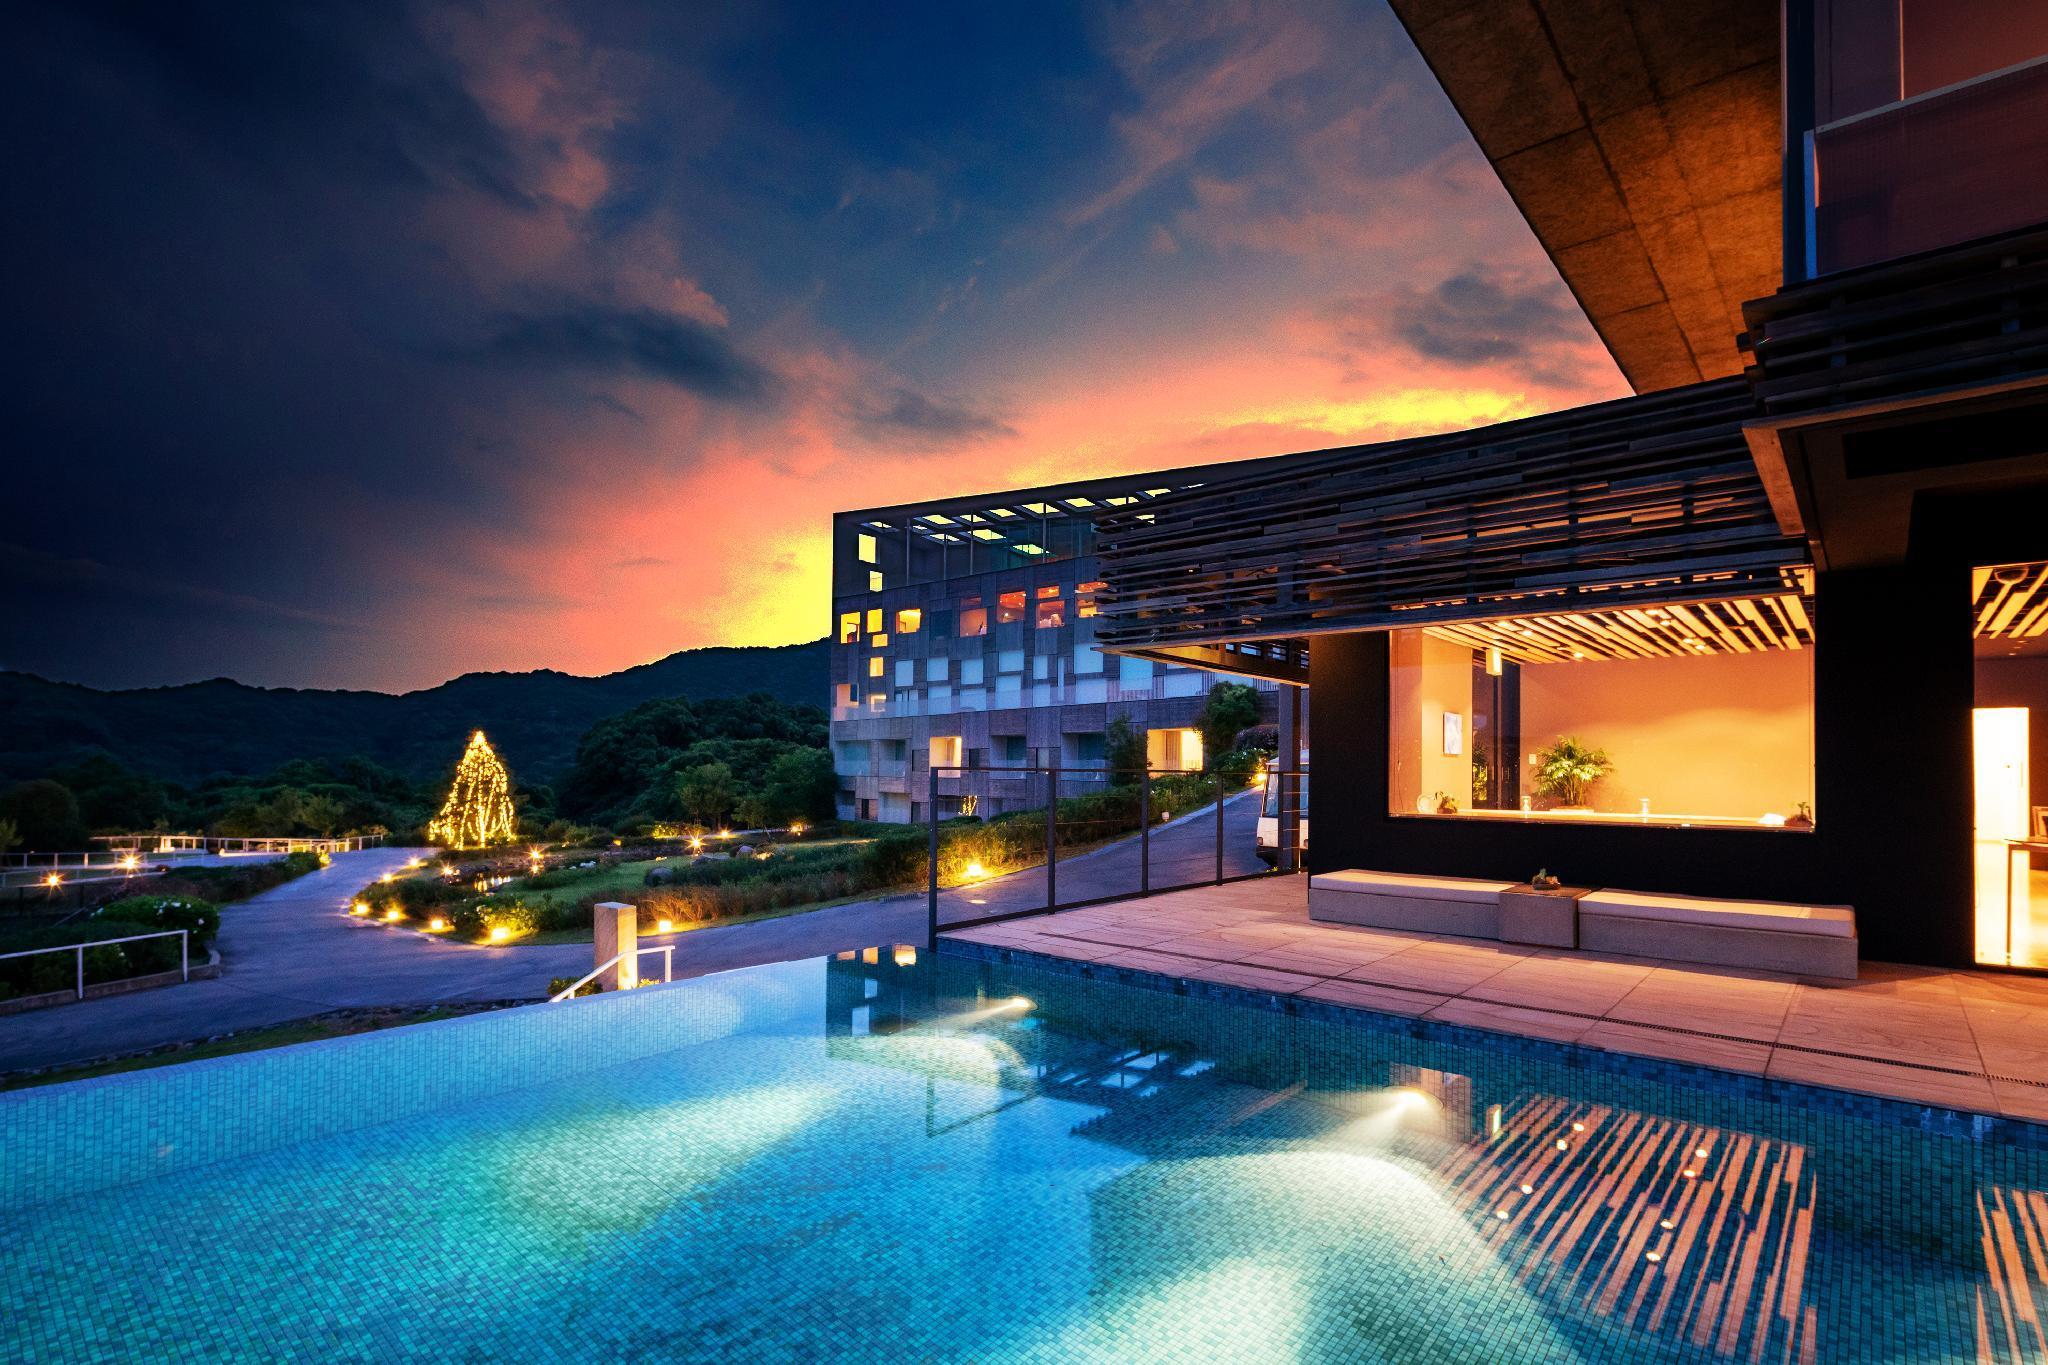 Garden Terrace Nagasaki Hotel And Resort